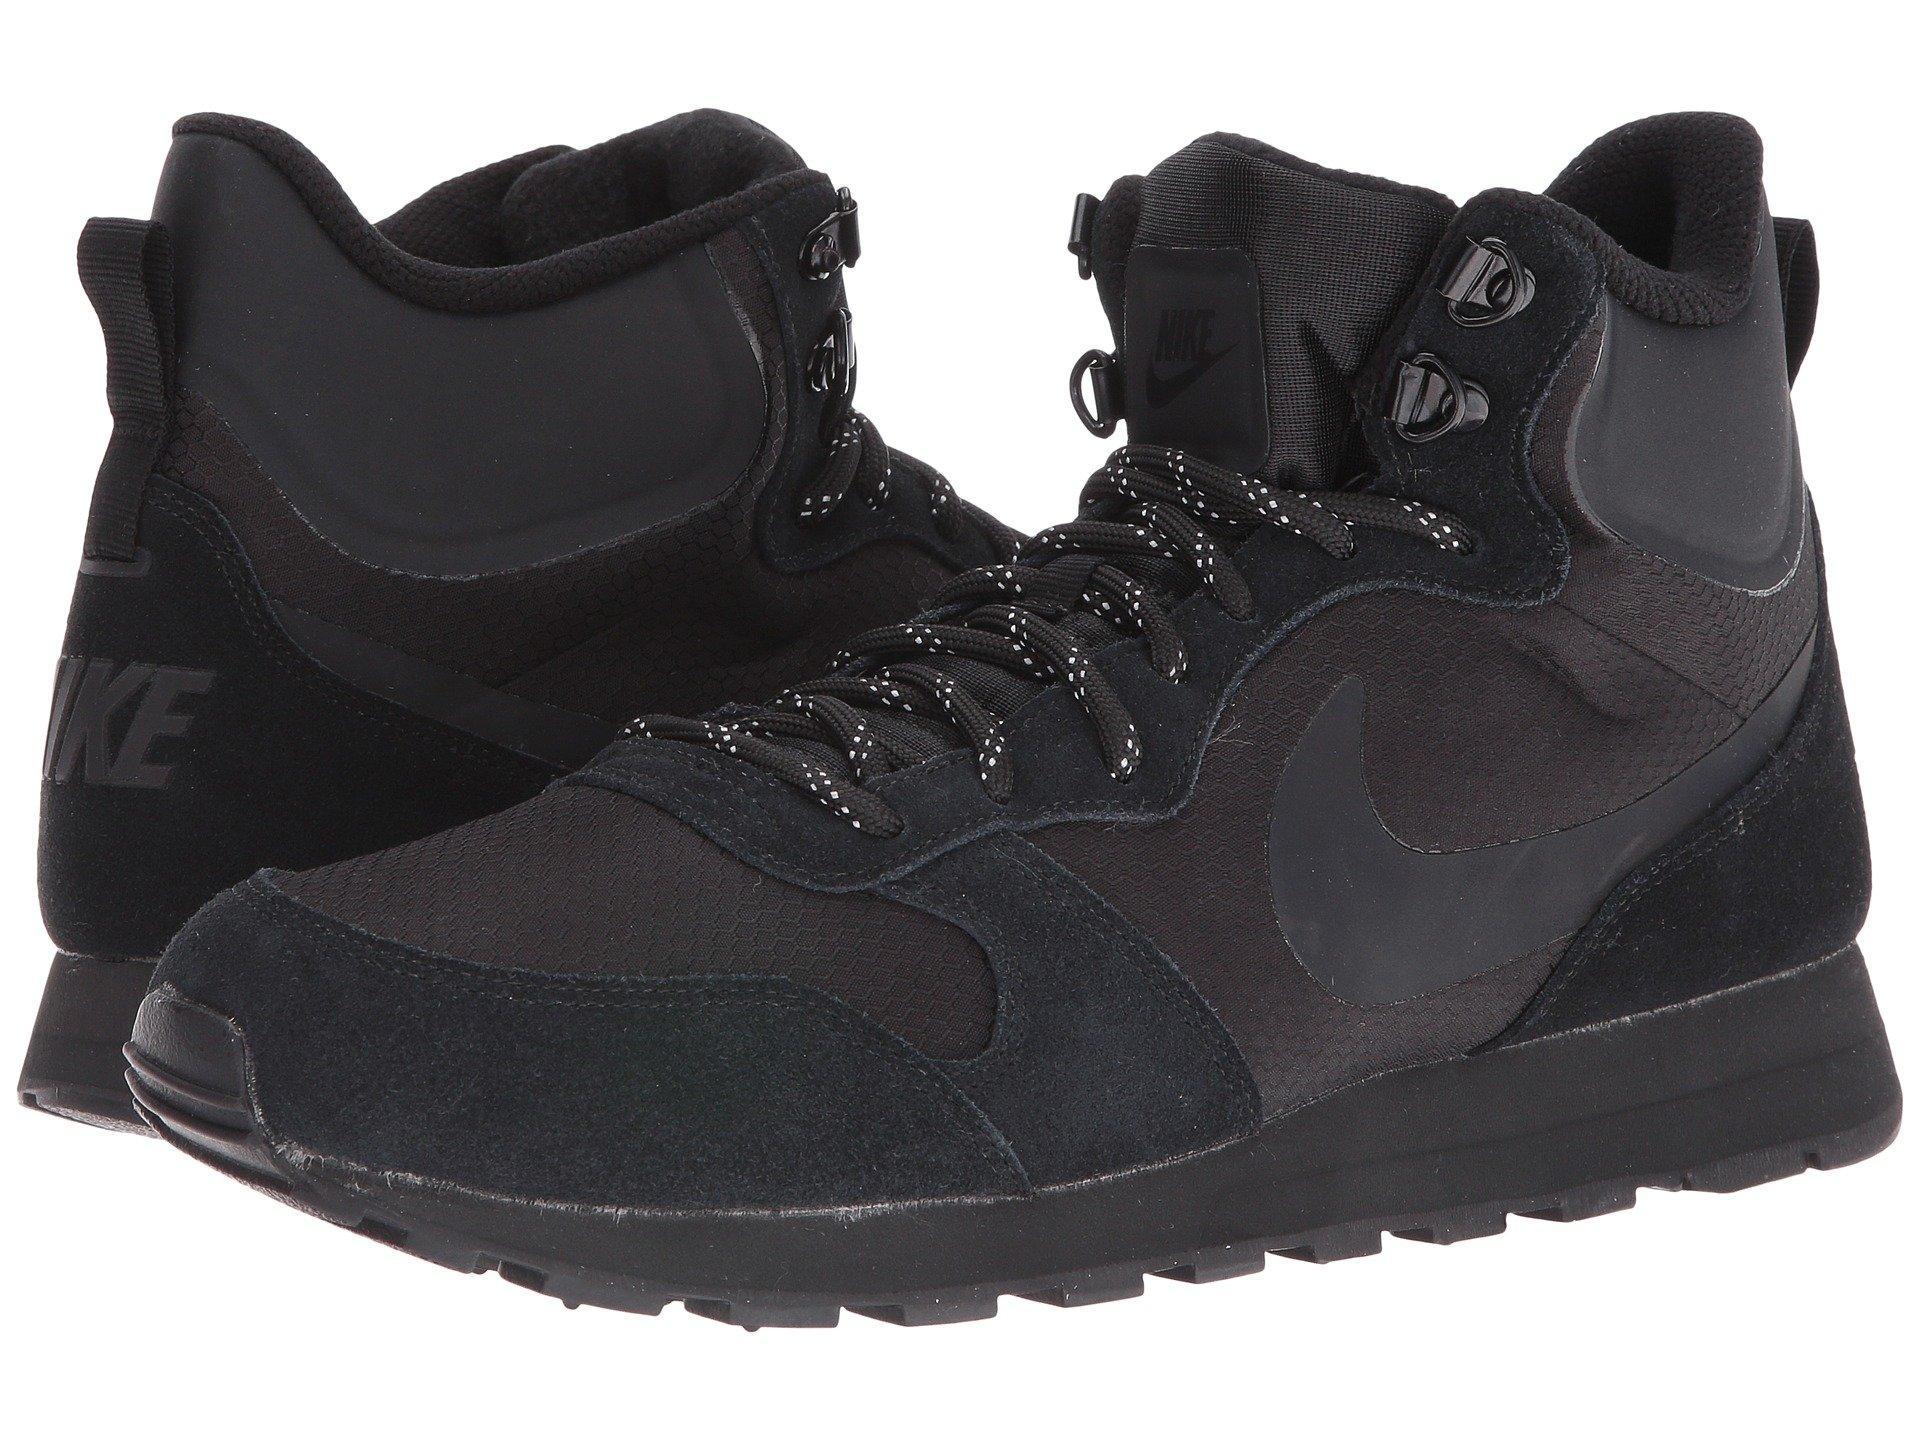 hogar Albardilla Pato  Nike Md Runner 2 Mid Premium, Black/black/black | ModeSens